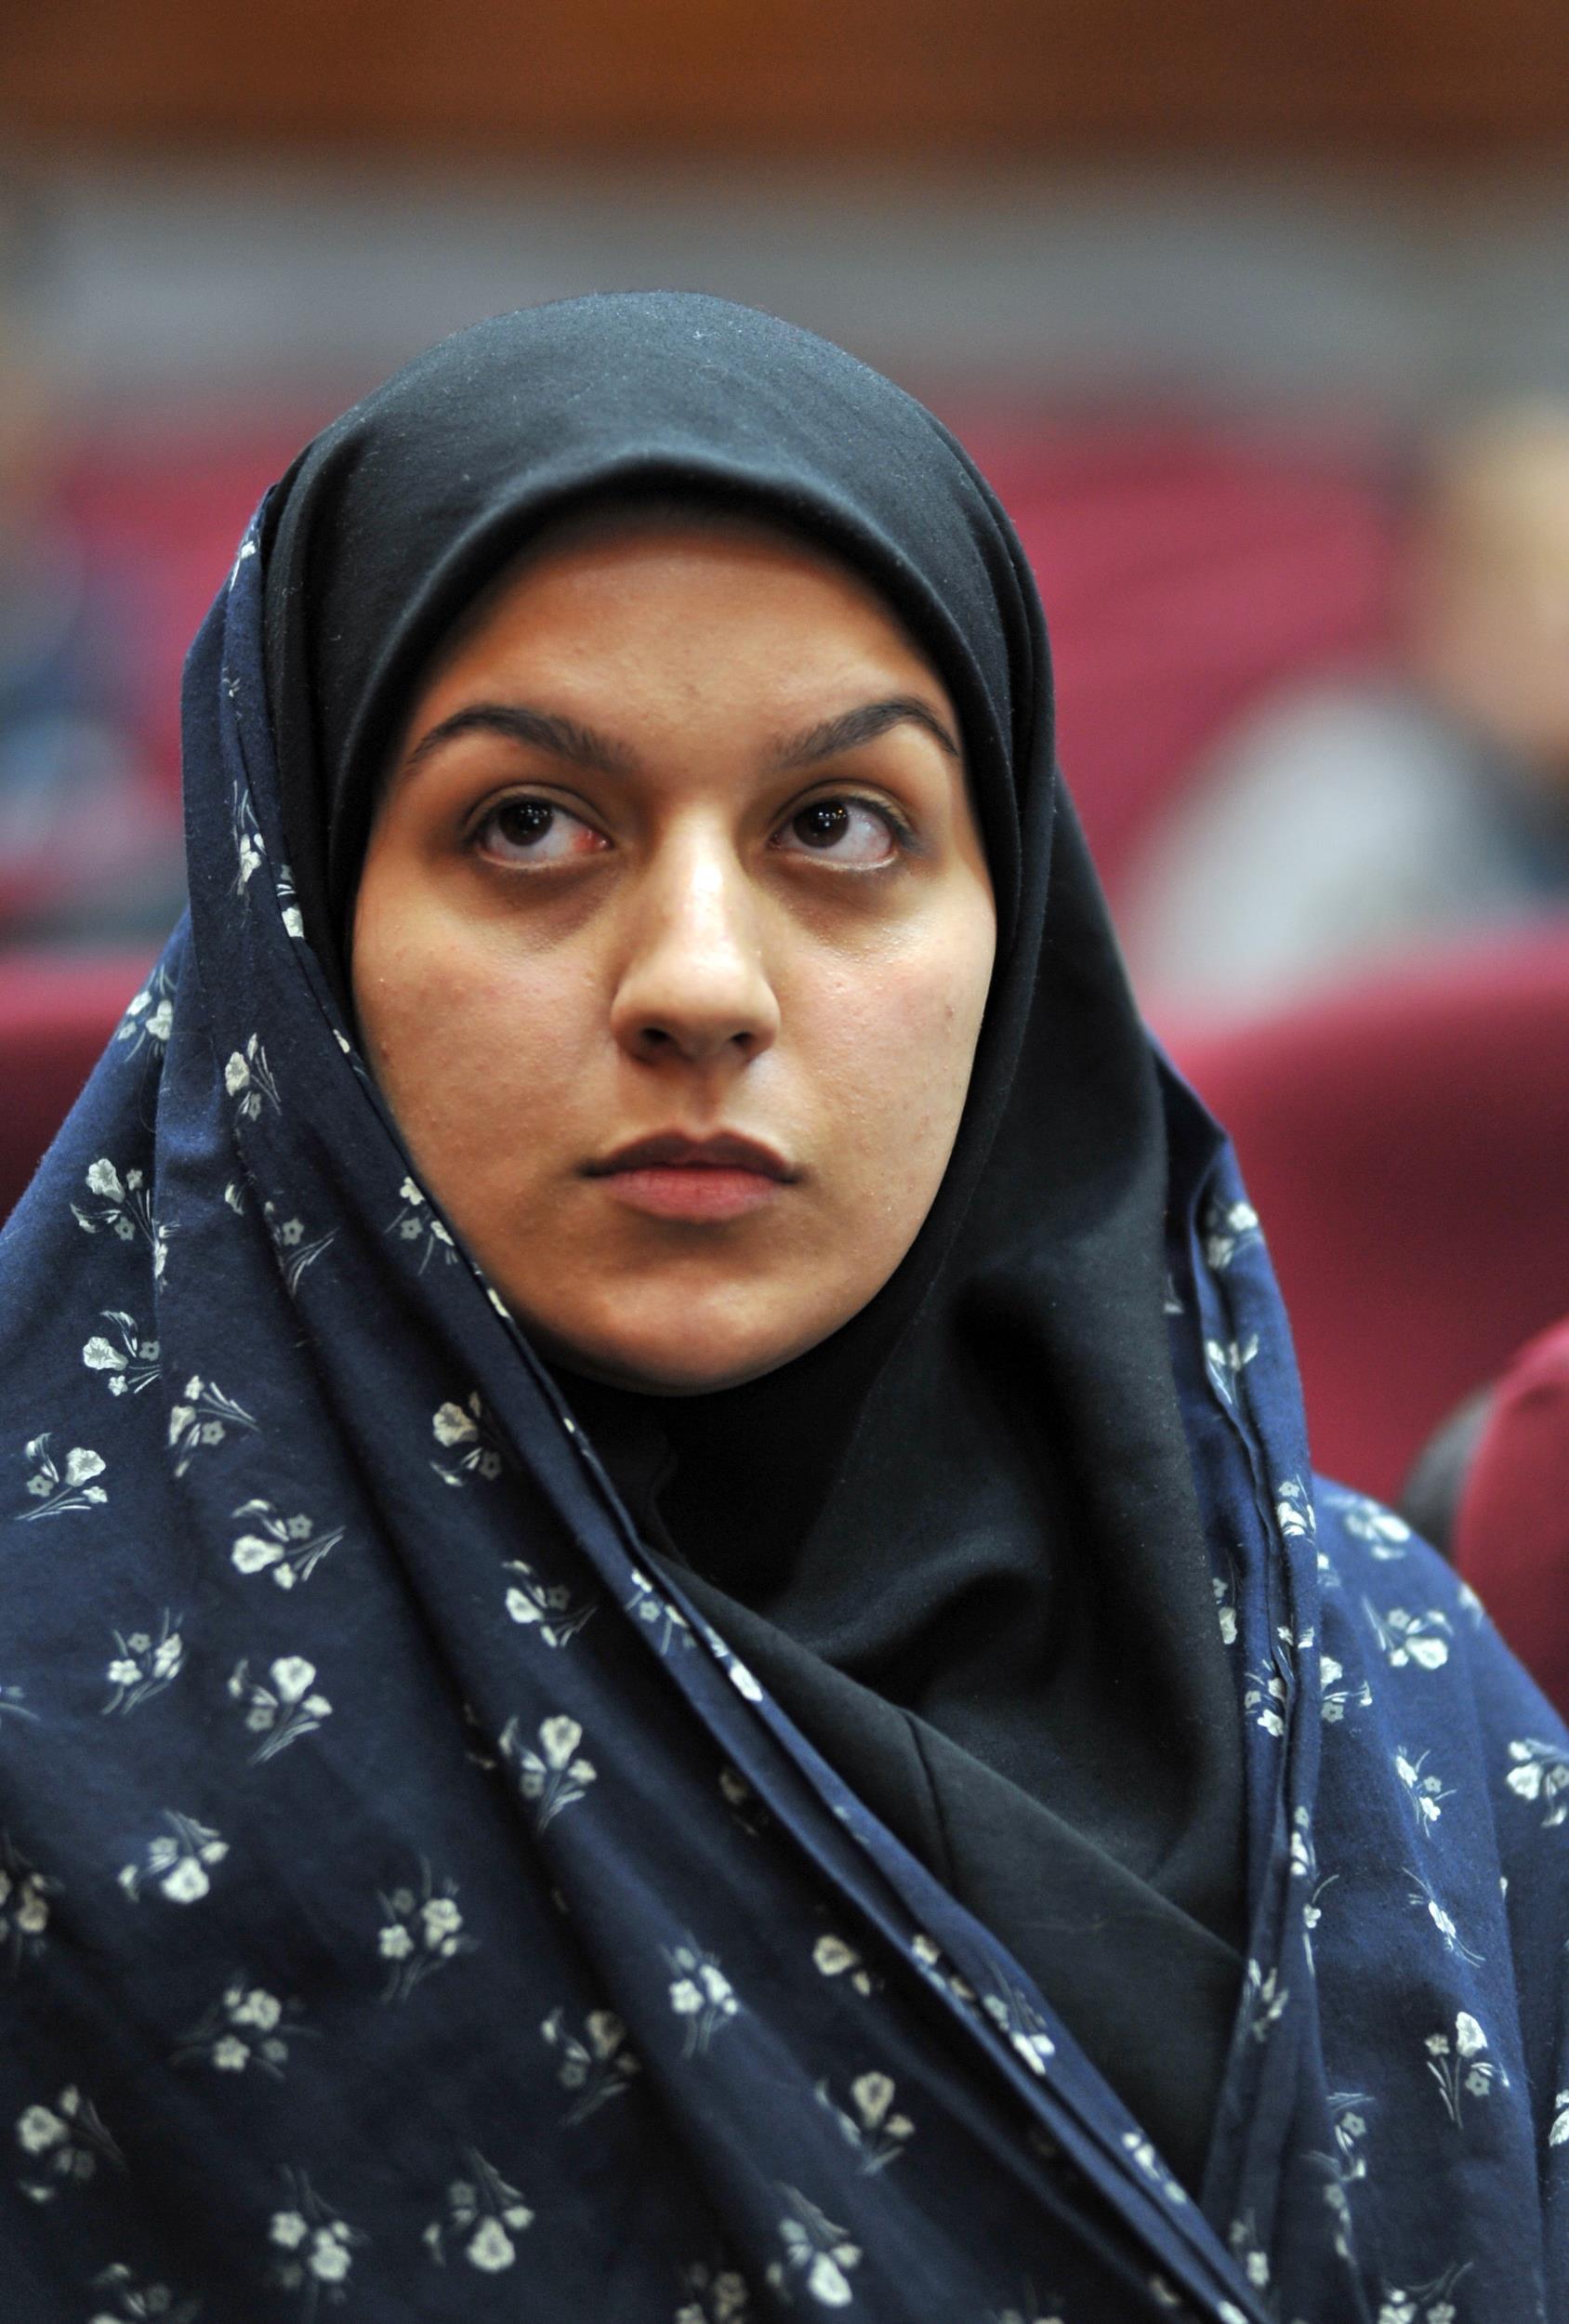 Iran Hangs Woman for Killing Alleged Rapist - NBC News